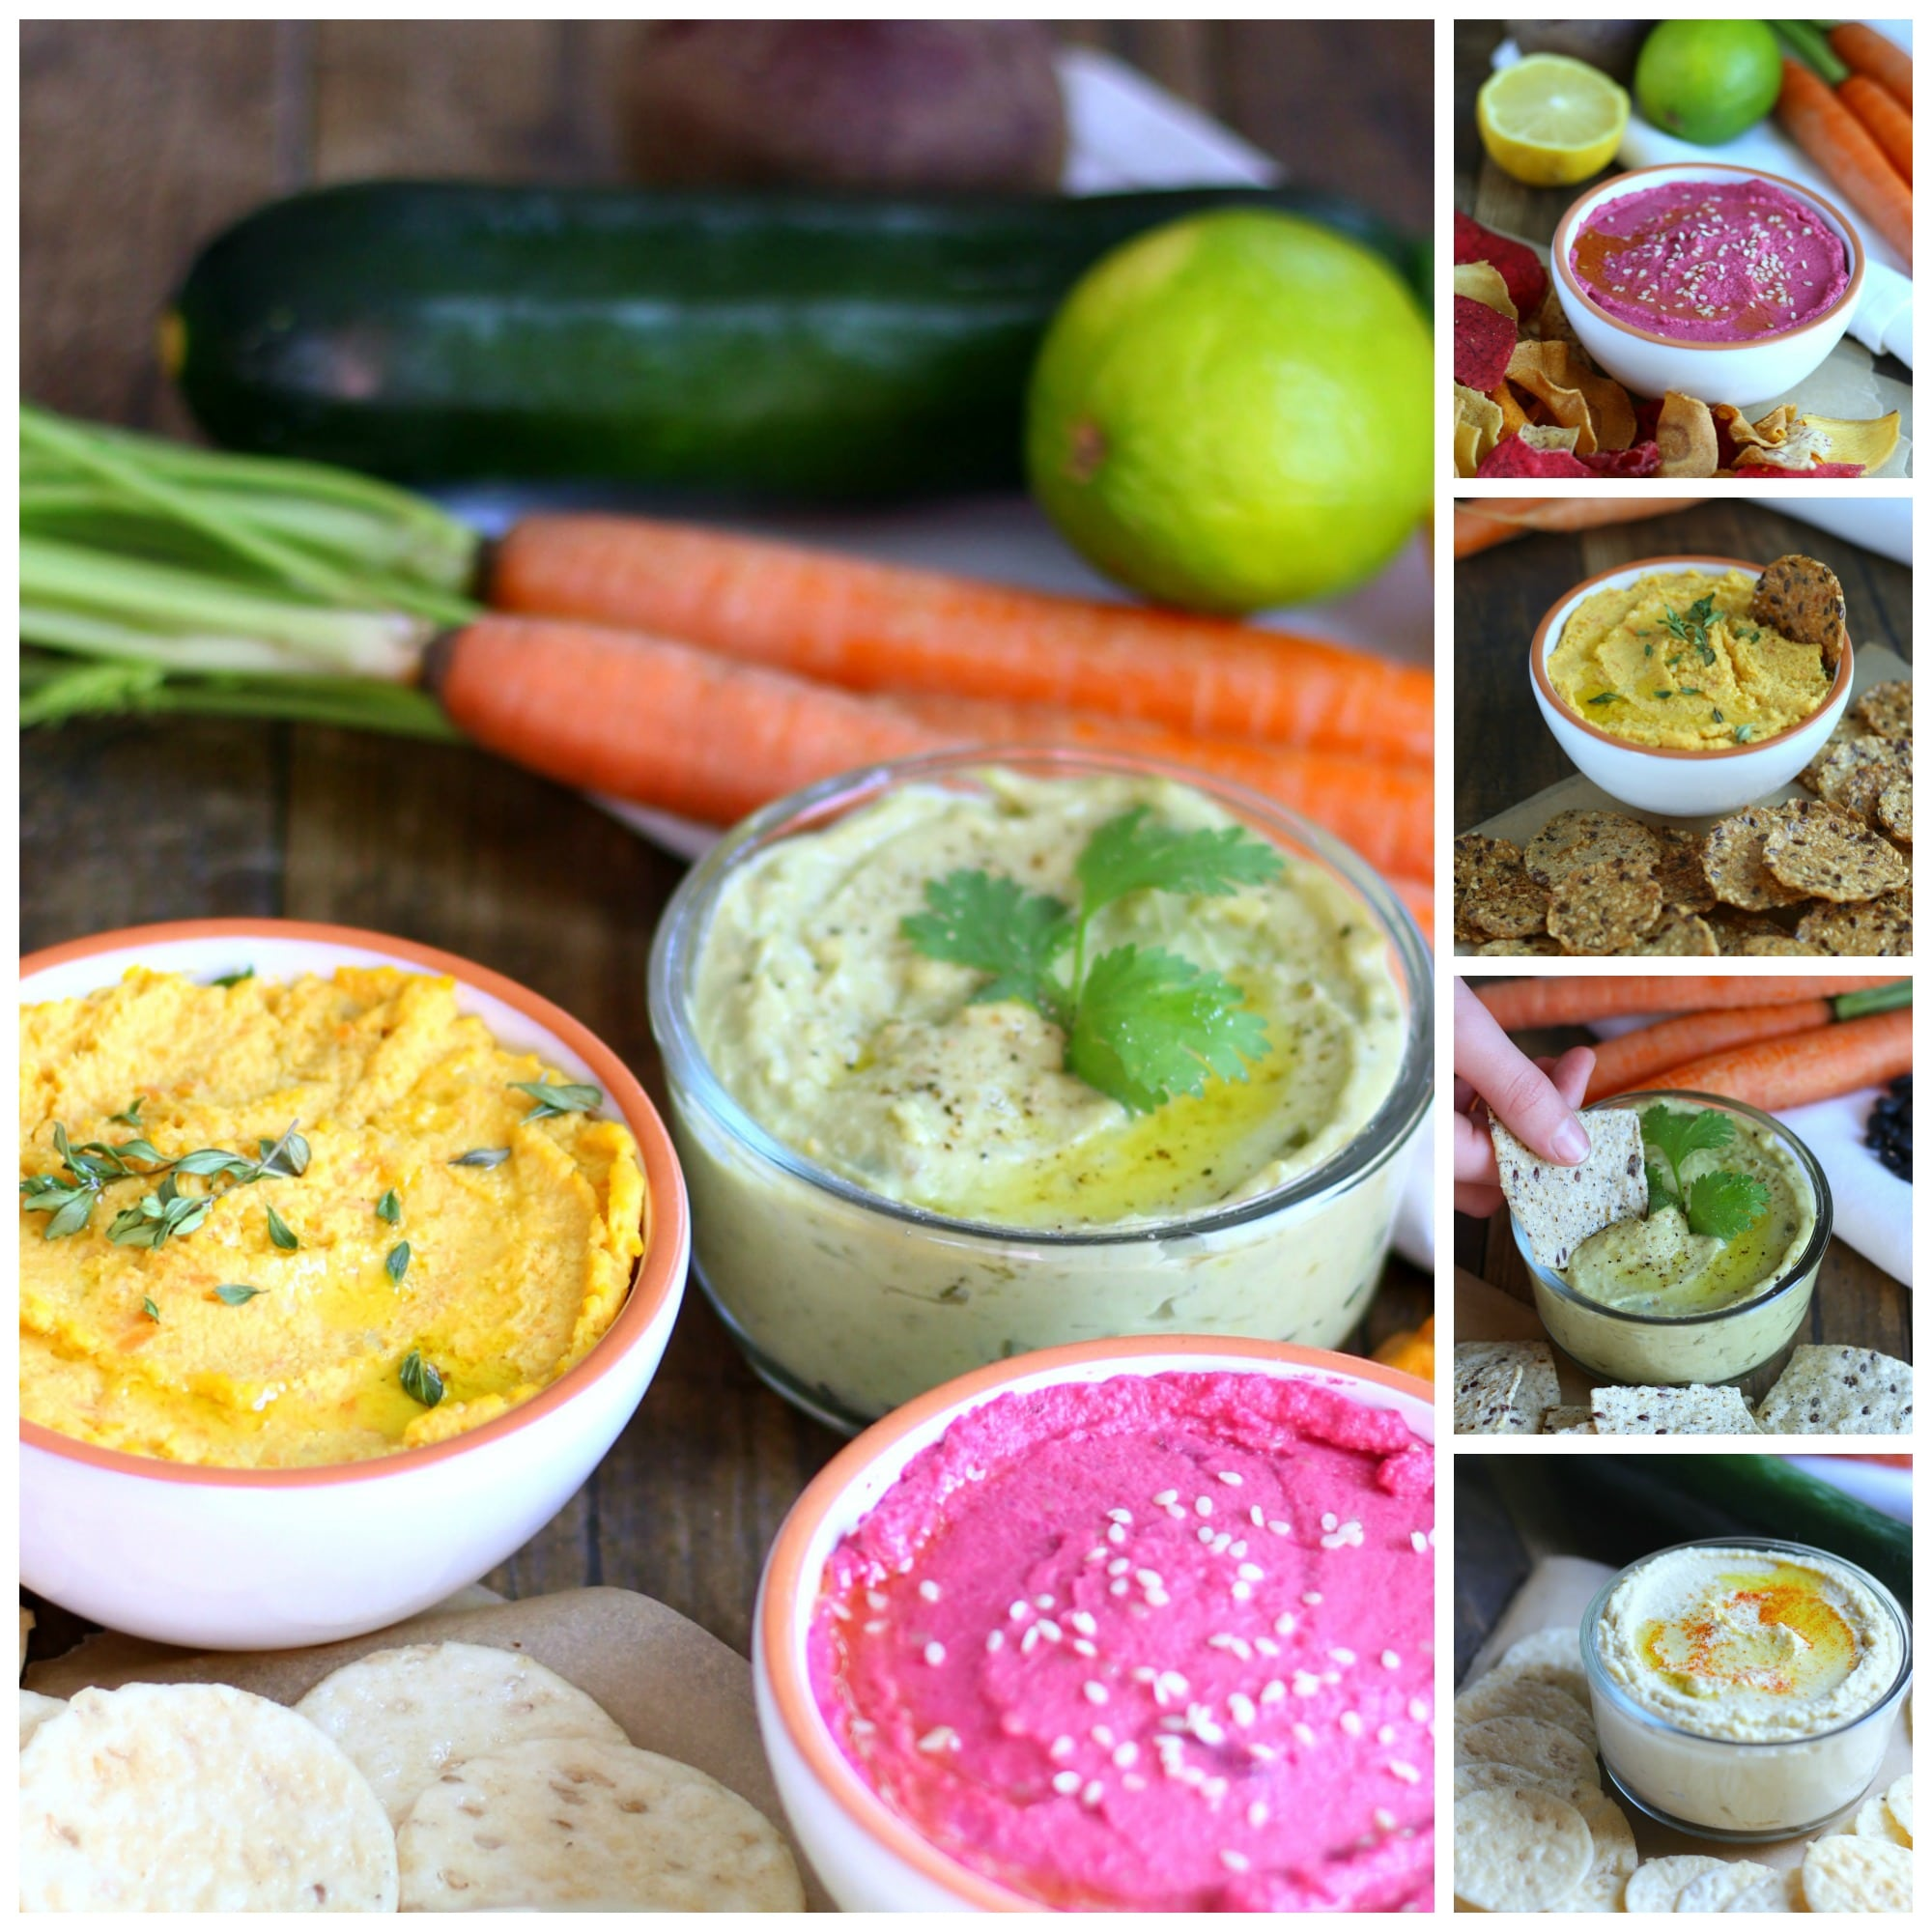 Best Paleo & Vegan Hummus Recipes